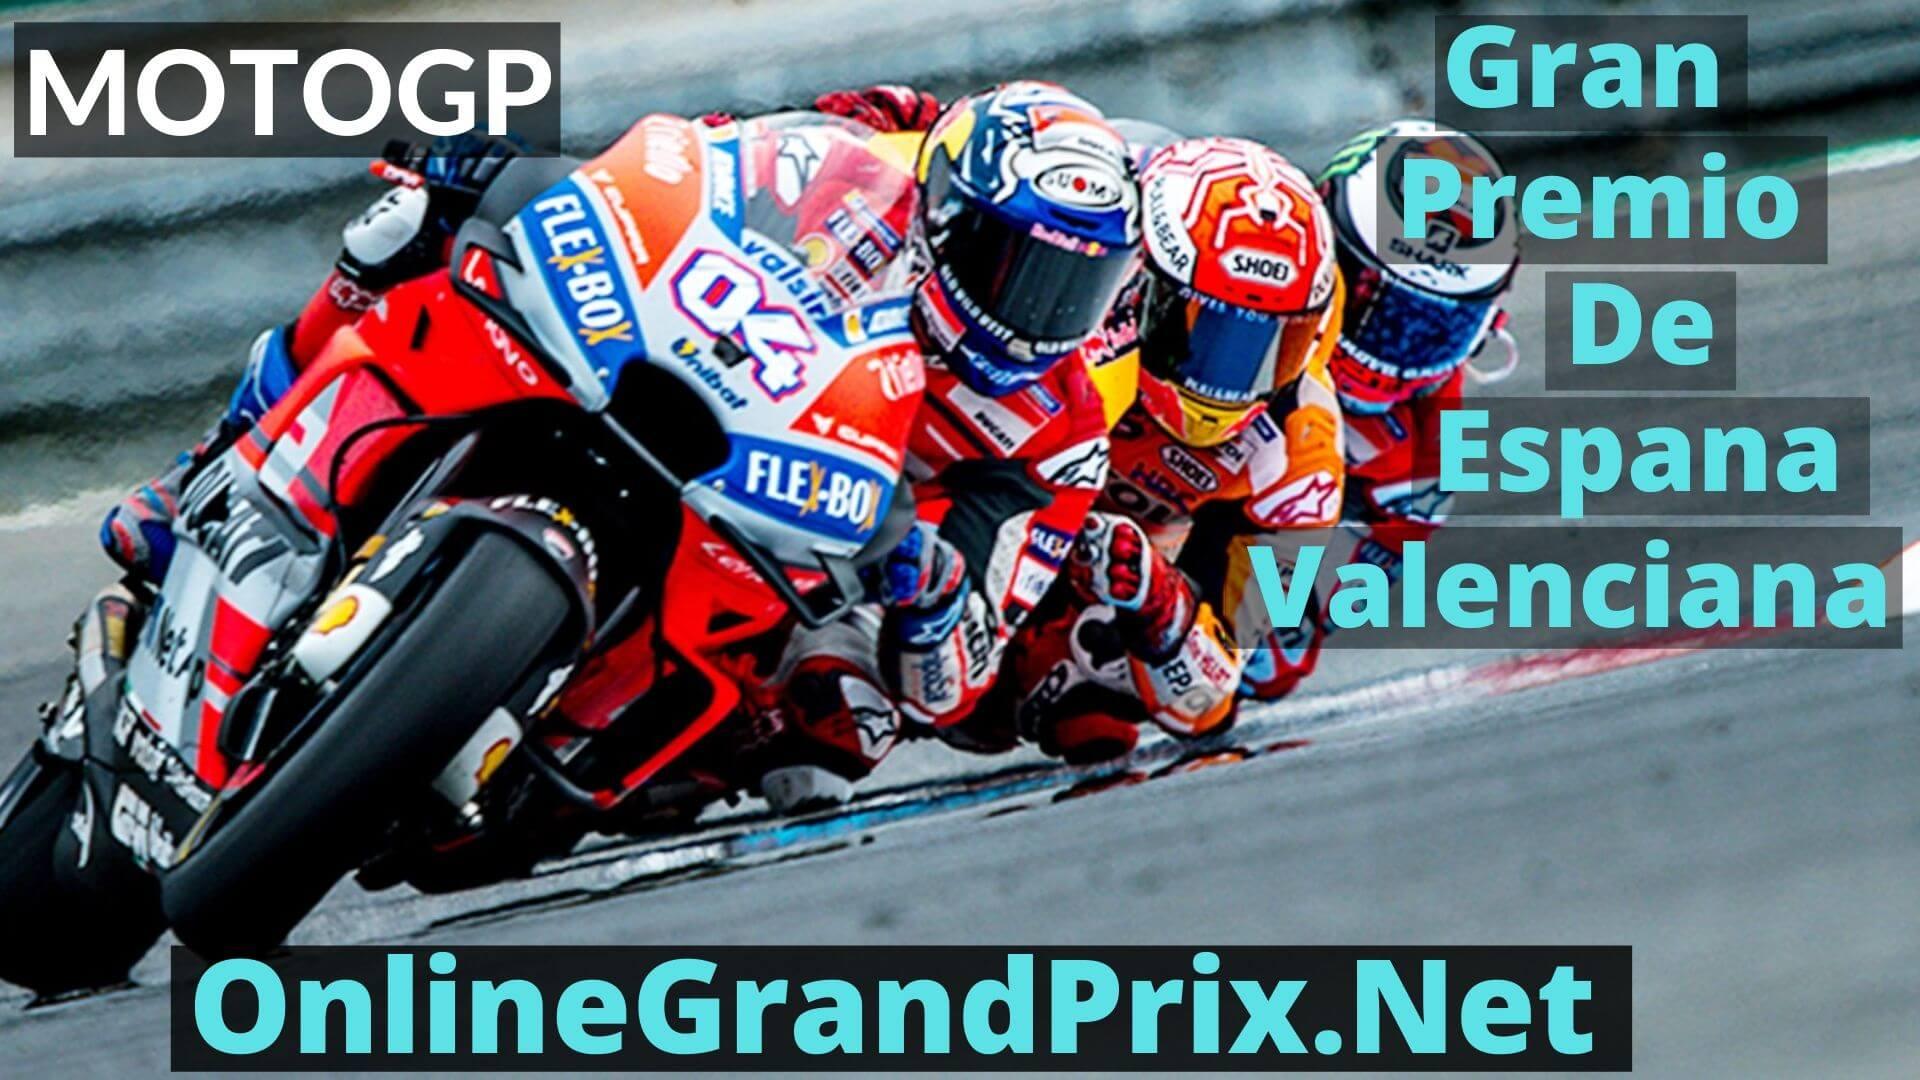 Gran Premio de Espana Live Stream 2020 | MotoGP